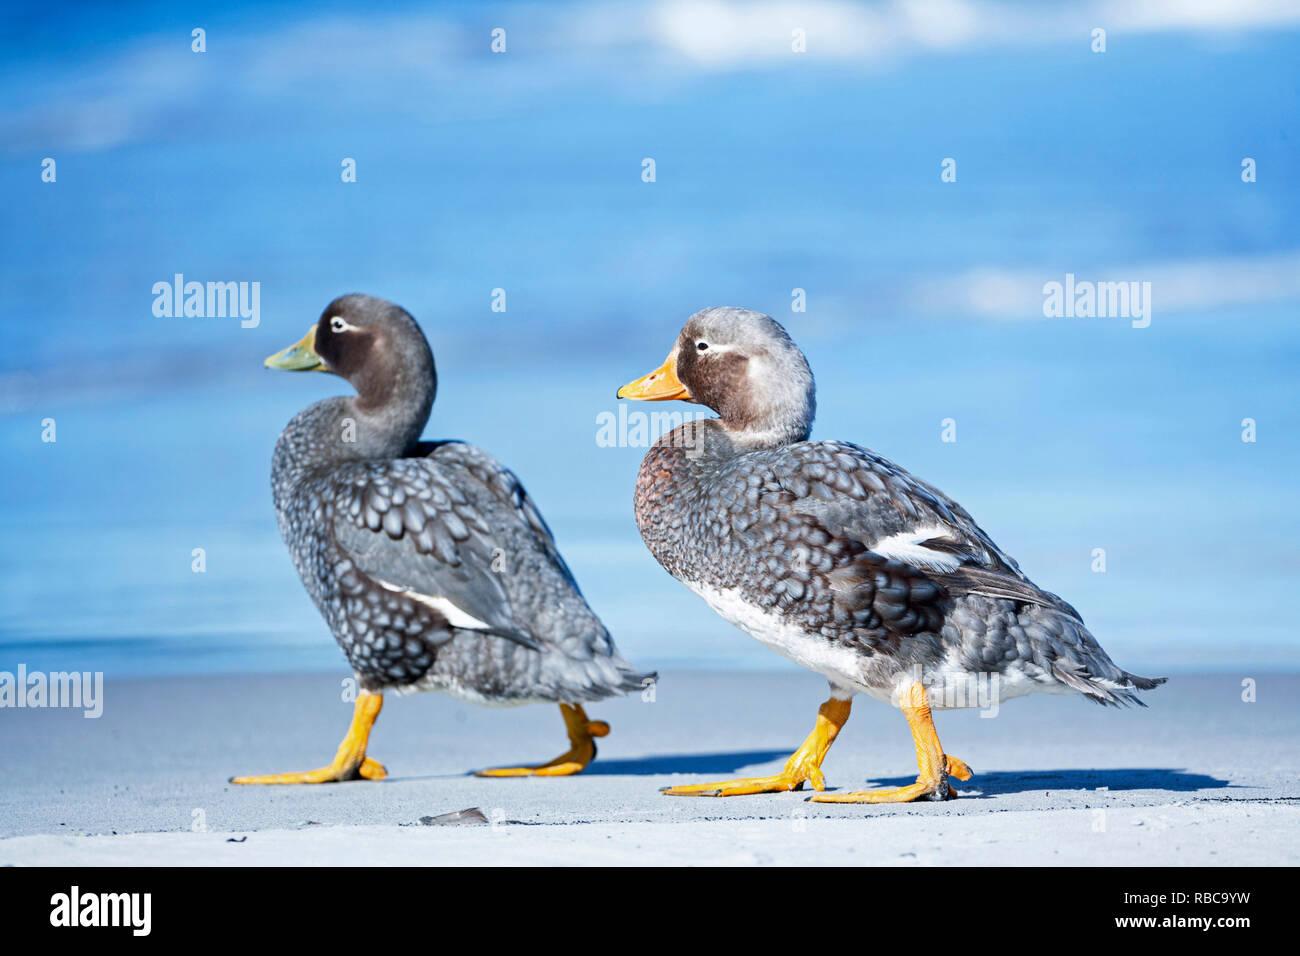 A male and a female steamer ducks (Tachyeres brachypterus) walking together, Sea Lion Island, Falkland Islands, Stock Photo